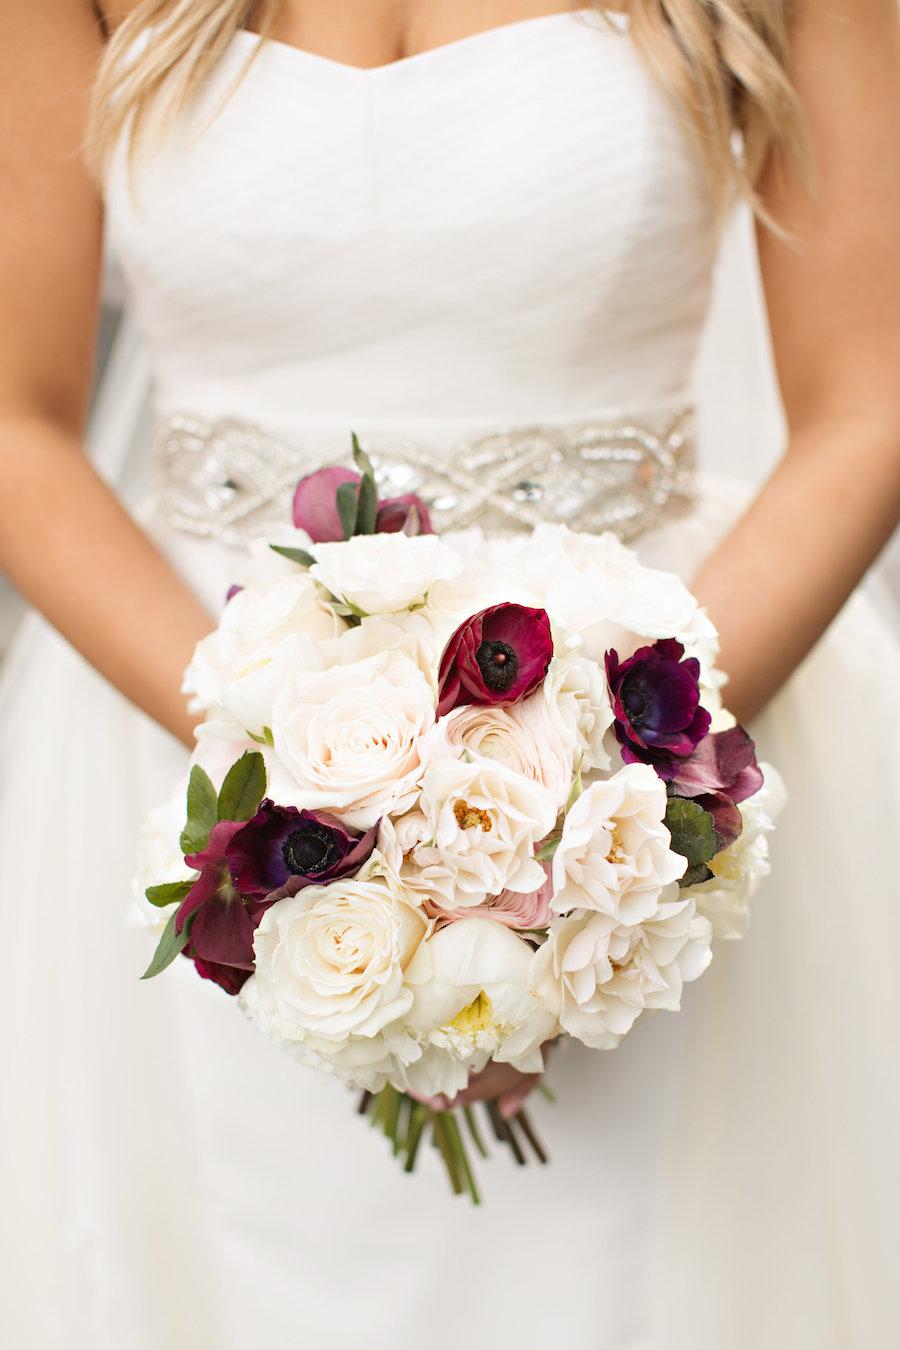 roque-events-marissa-rob-wedding-brooke-beasley-photography-portraits70.jpg